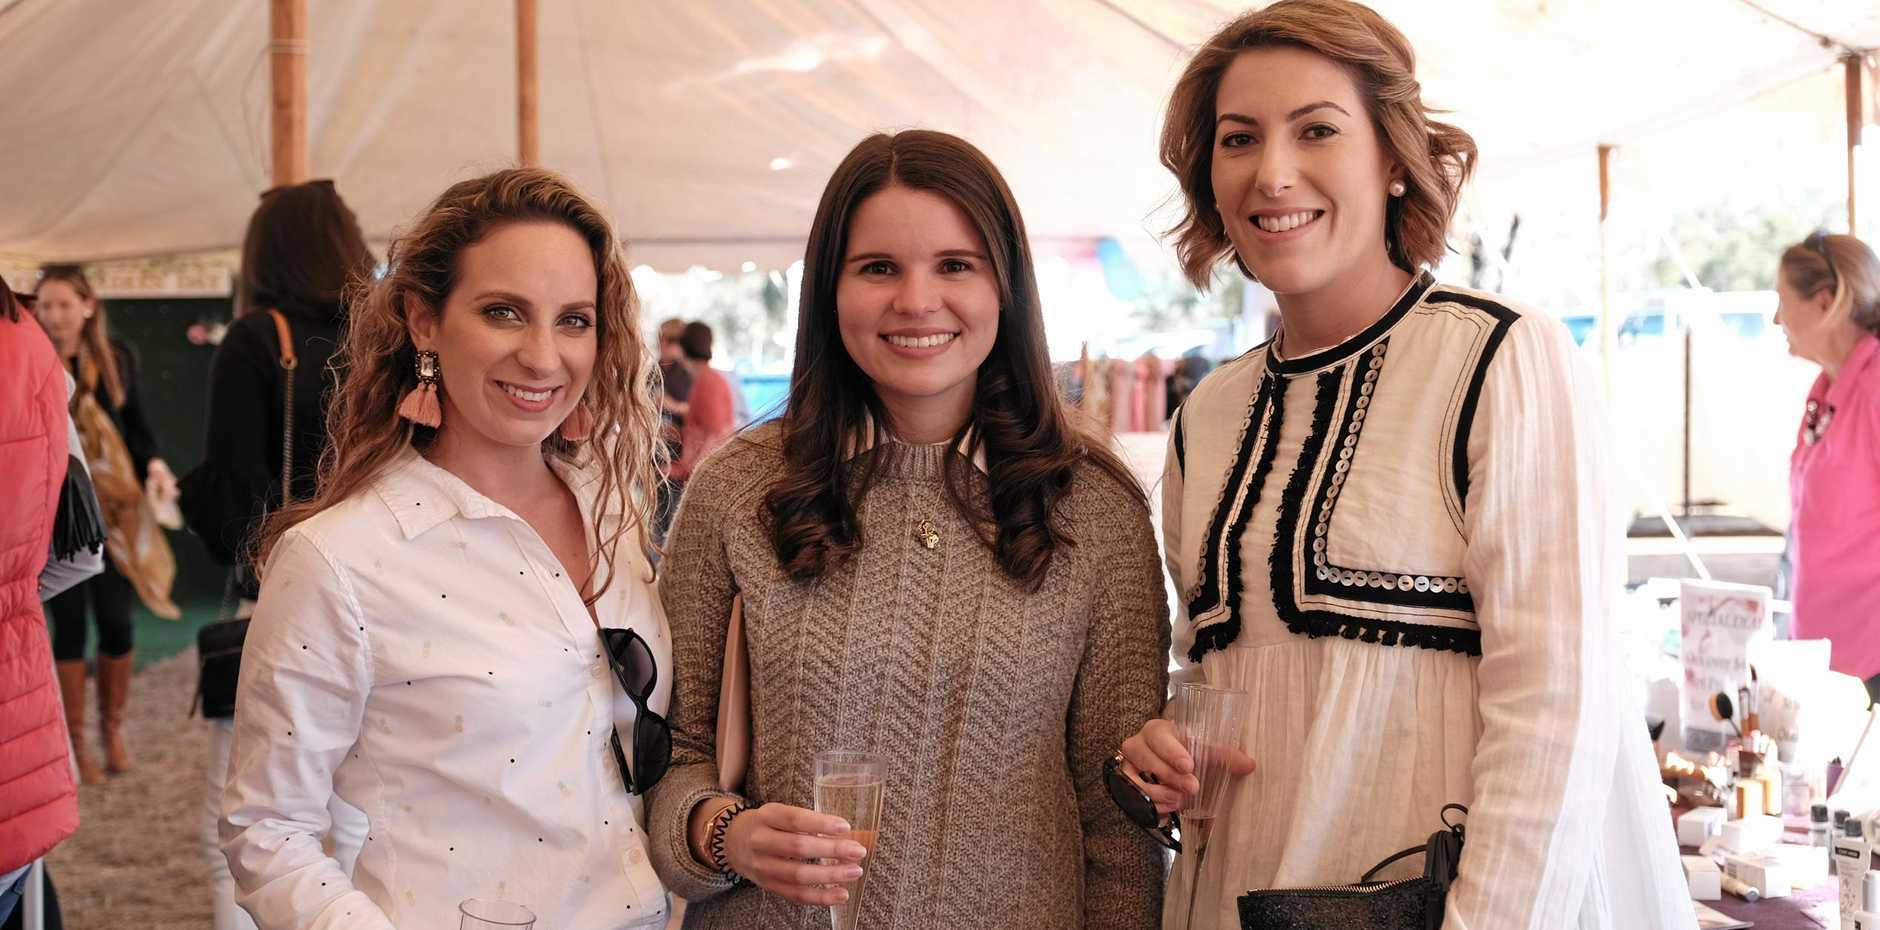 Steph Robinson, Anna Halloran and Jess Land at the Condamine Cods Ladies' Day last year.